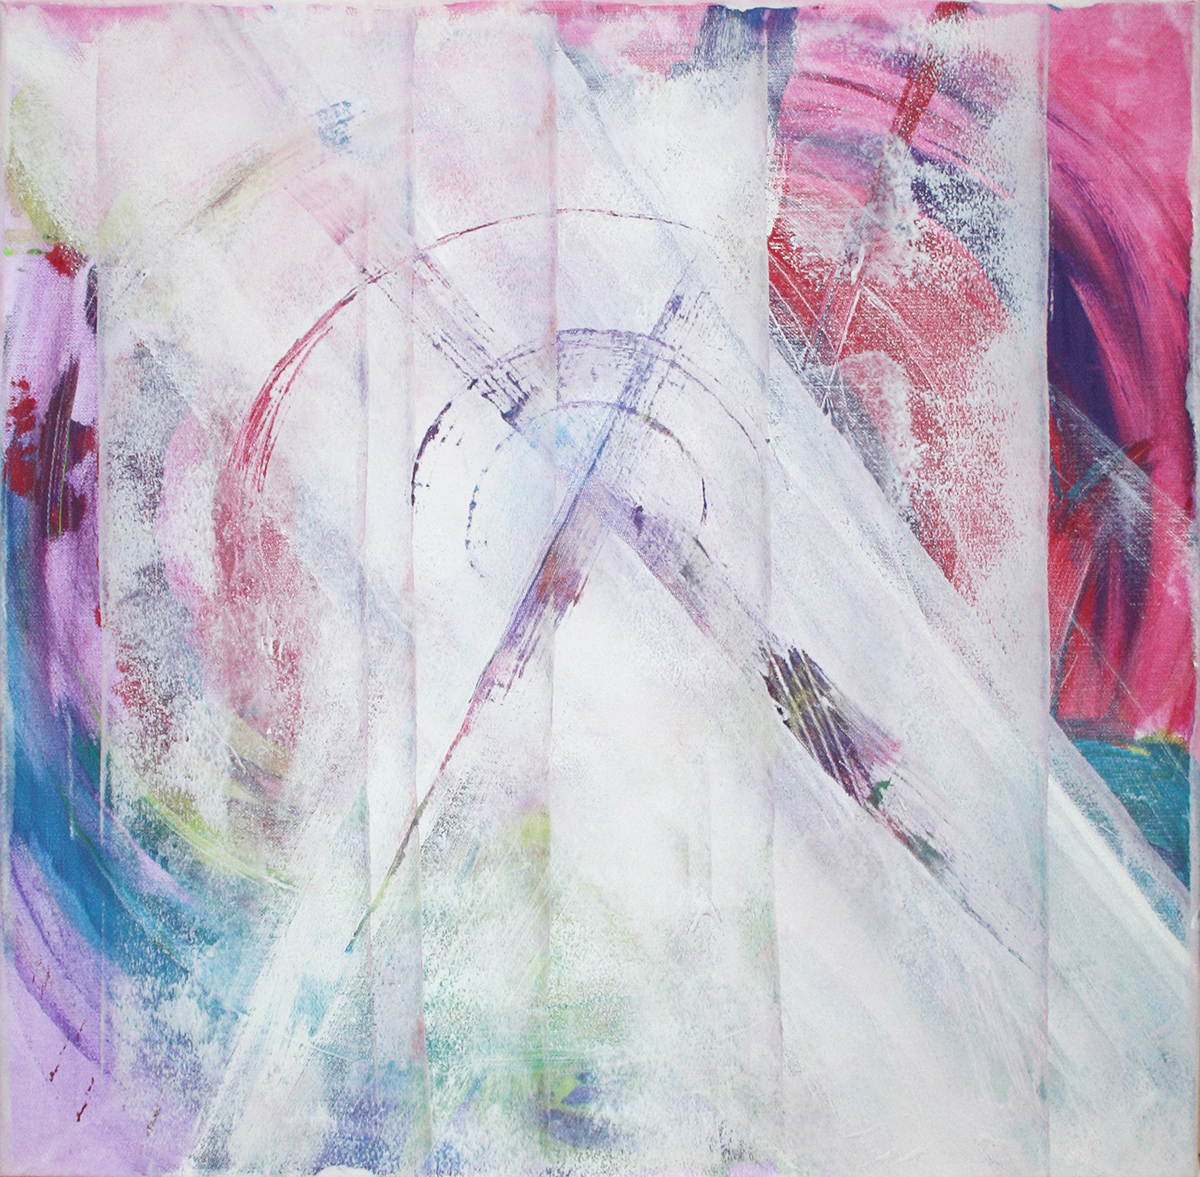 Simone Louis - Cross and Circle